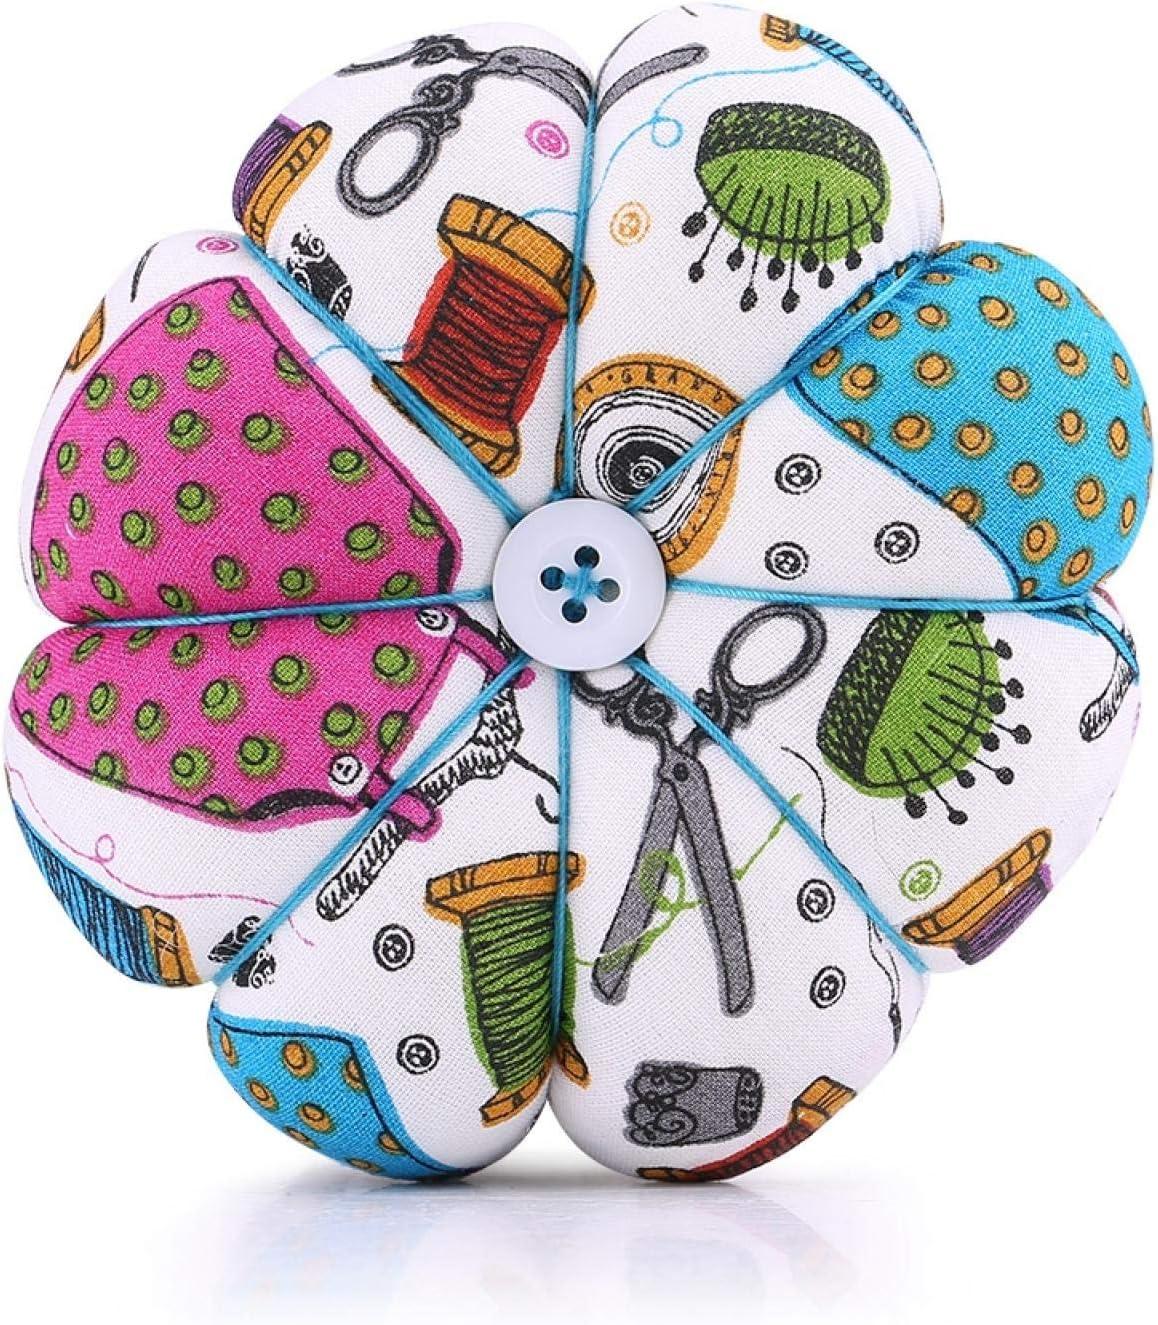 Charlotte Indianapolis Mall Mall Tyenaza Creative Pumpkin Fabric Sewing Needles Pin Cushion with